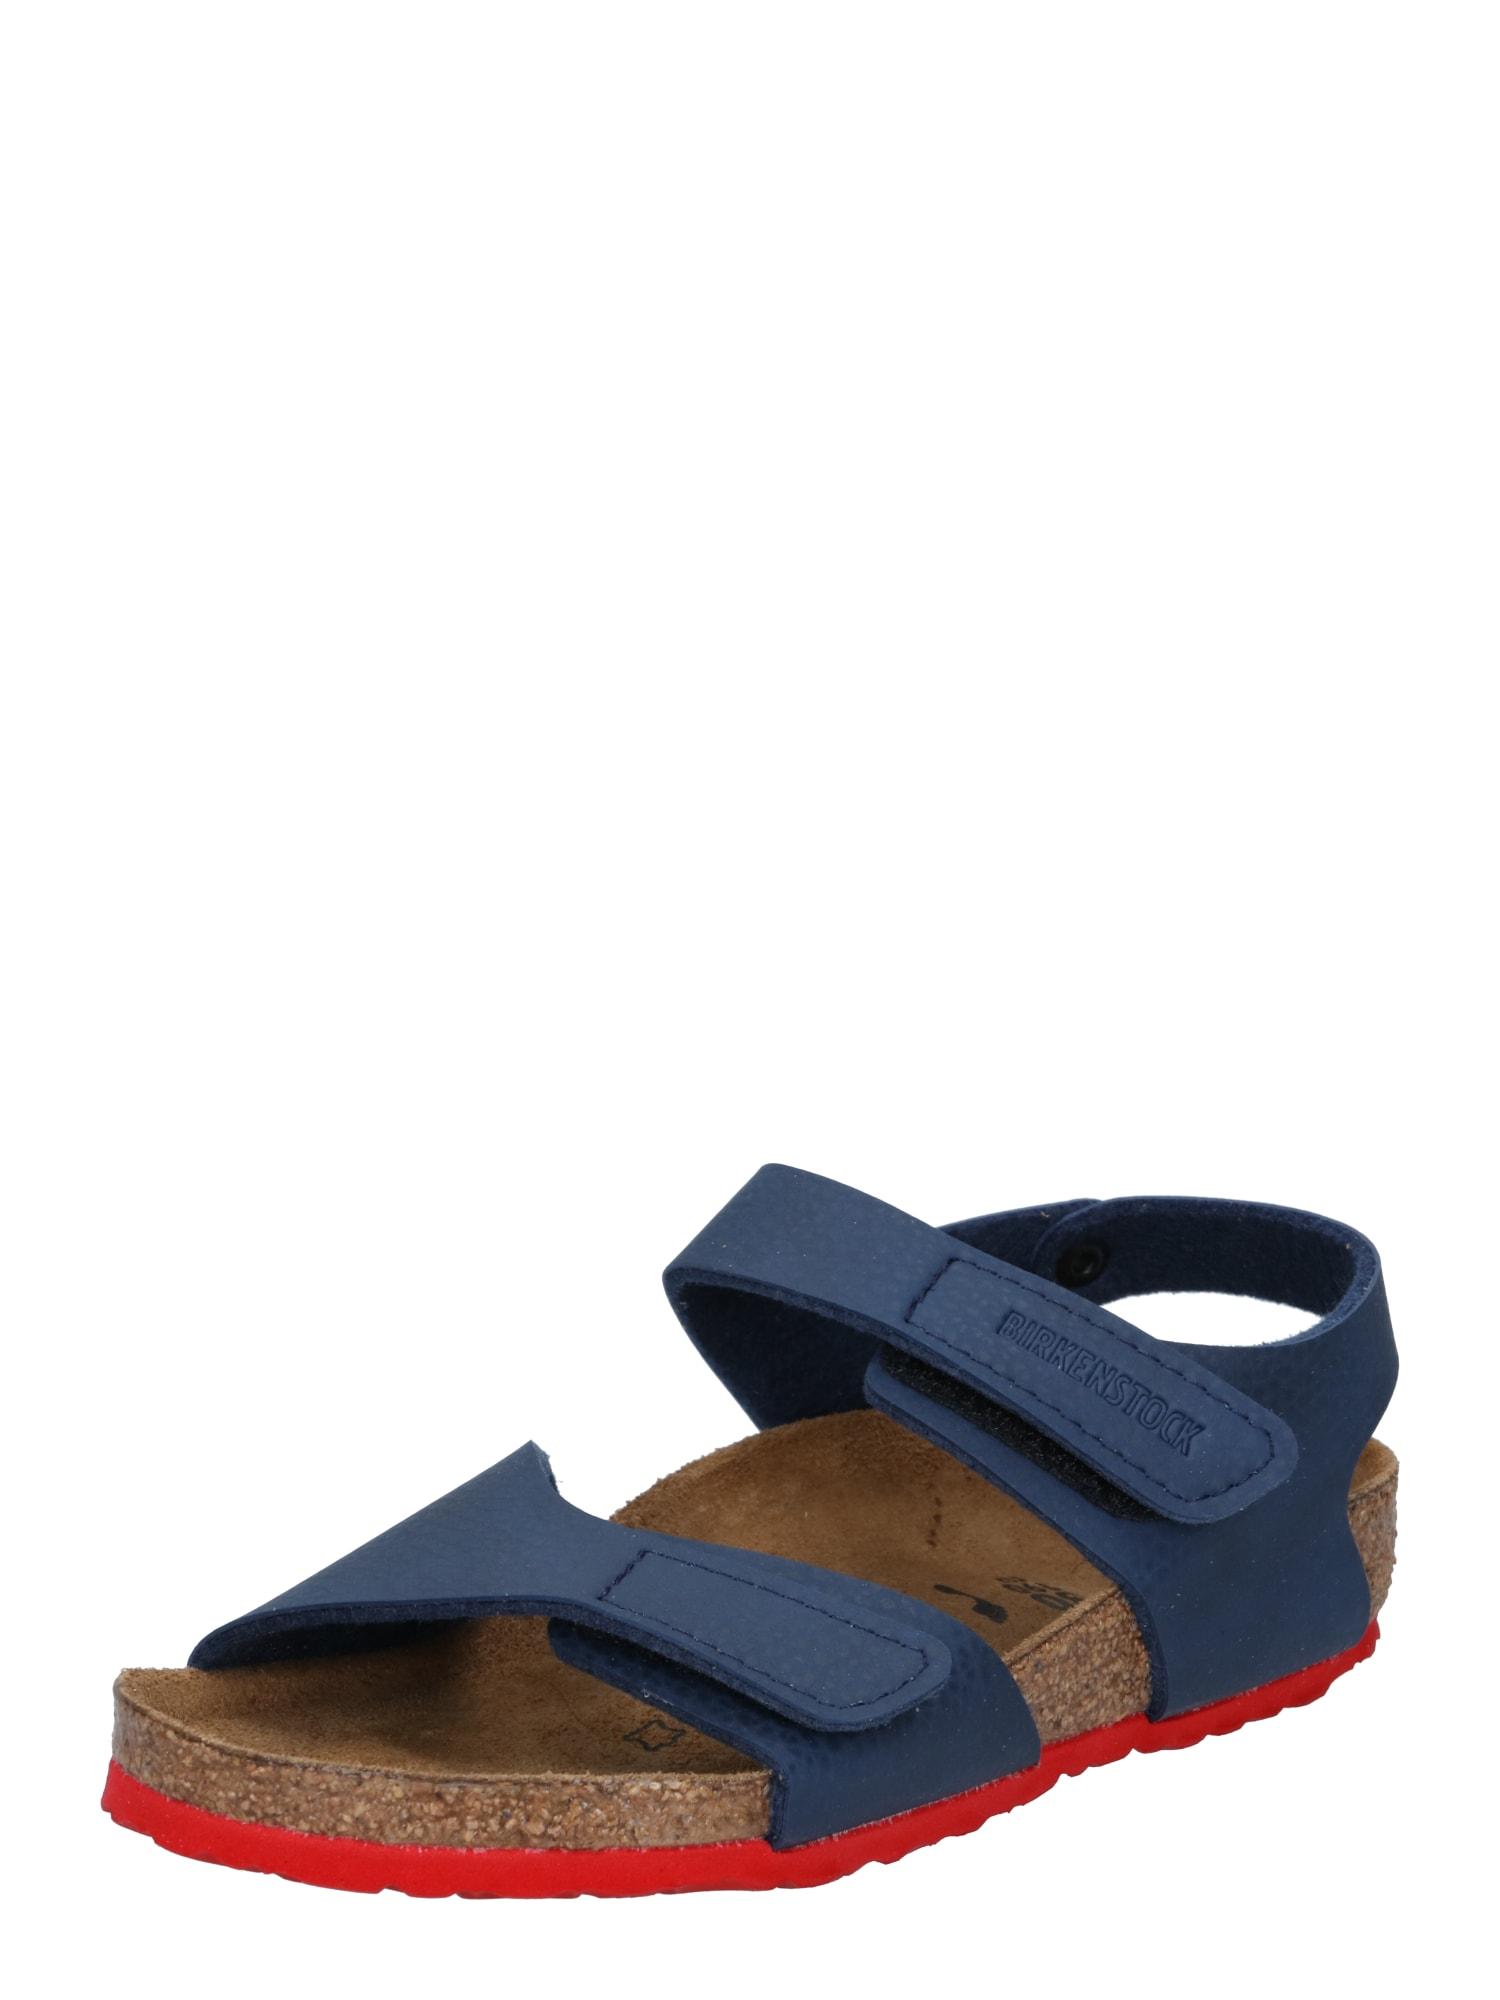 BIRKENSTOCK Atviri batai 'Palu' mėlyna